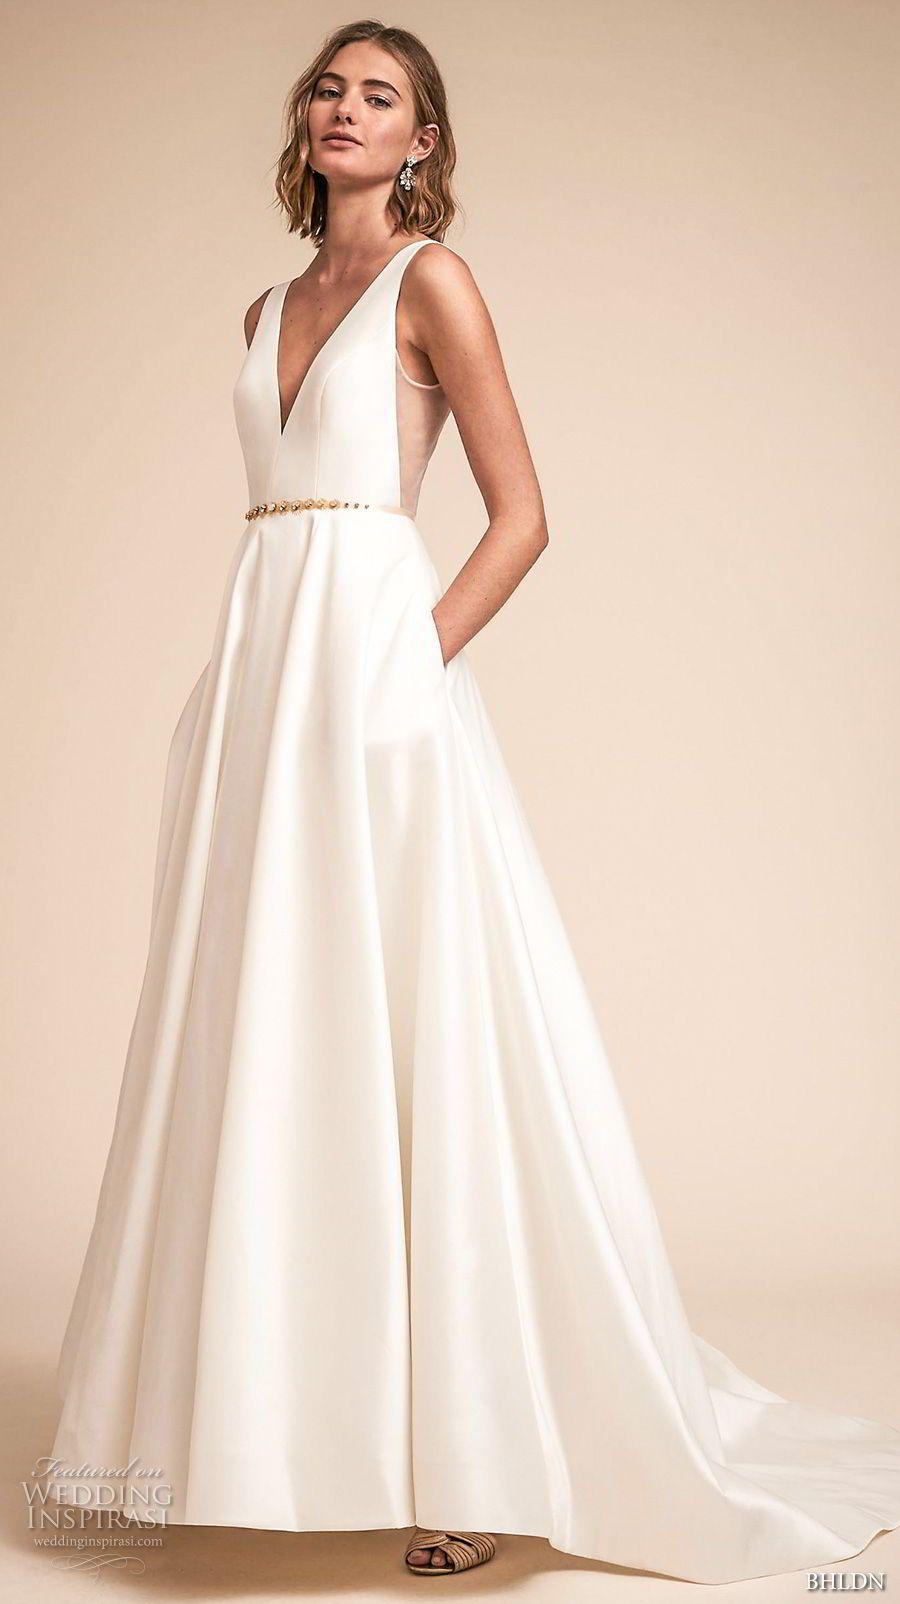 Bhldn Spring 2018 Wedding Dresses Wedding Inspirasi Bhldn Wedding Dress Wedding Dress Belt Wedding Dress With Pockets [ 1604 x 900 Pixel ]